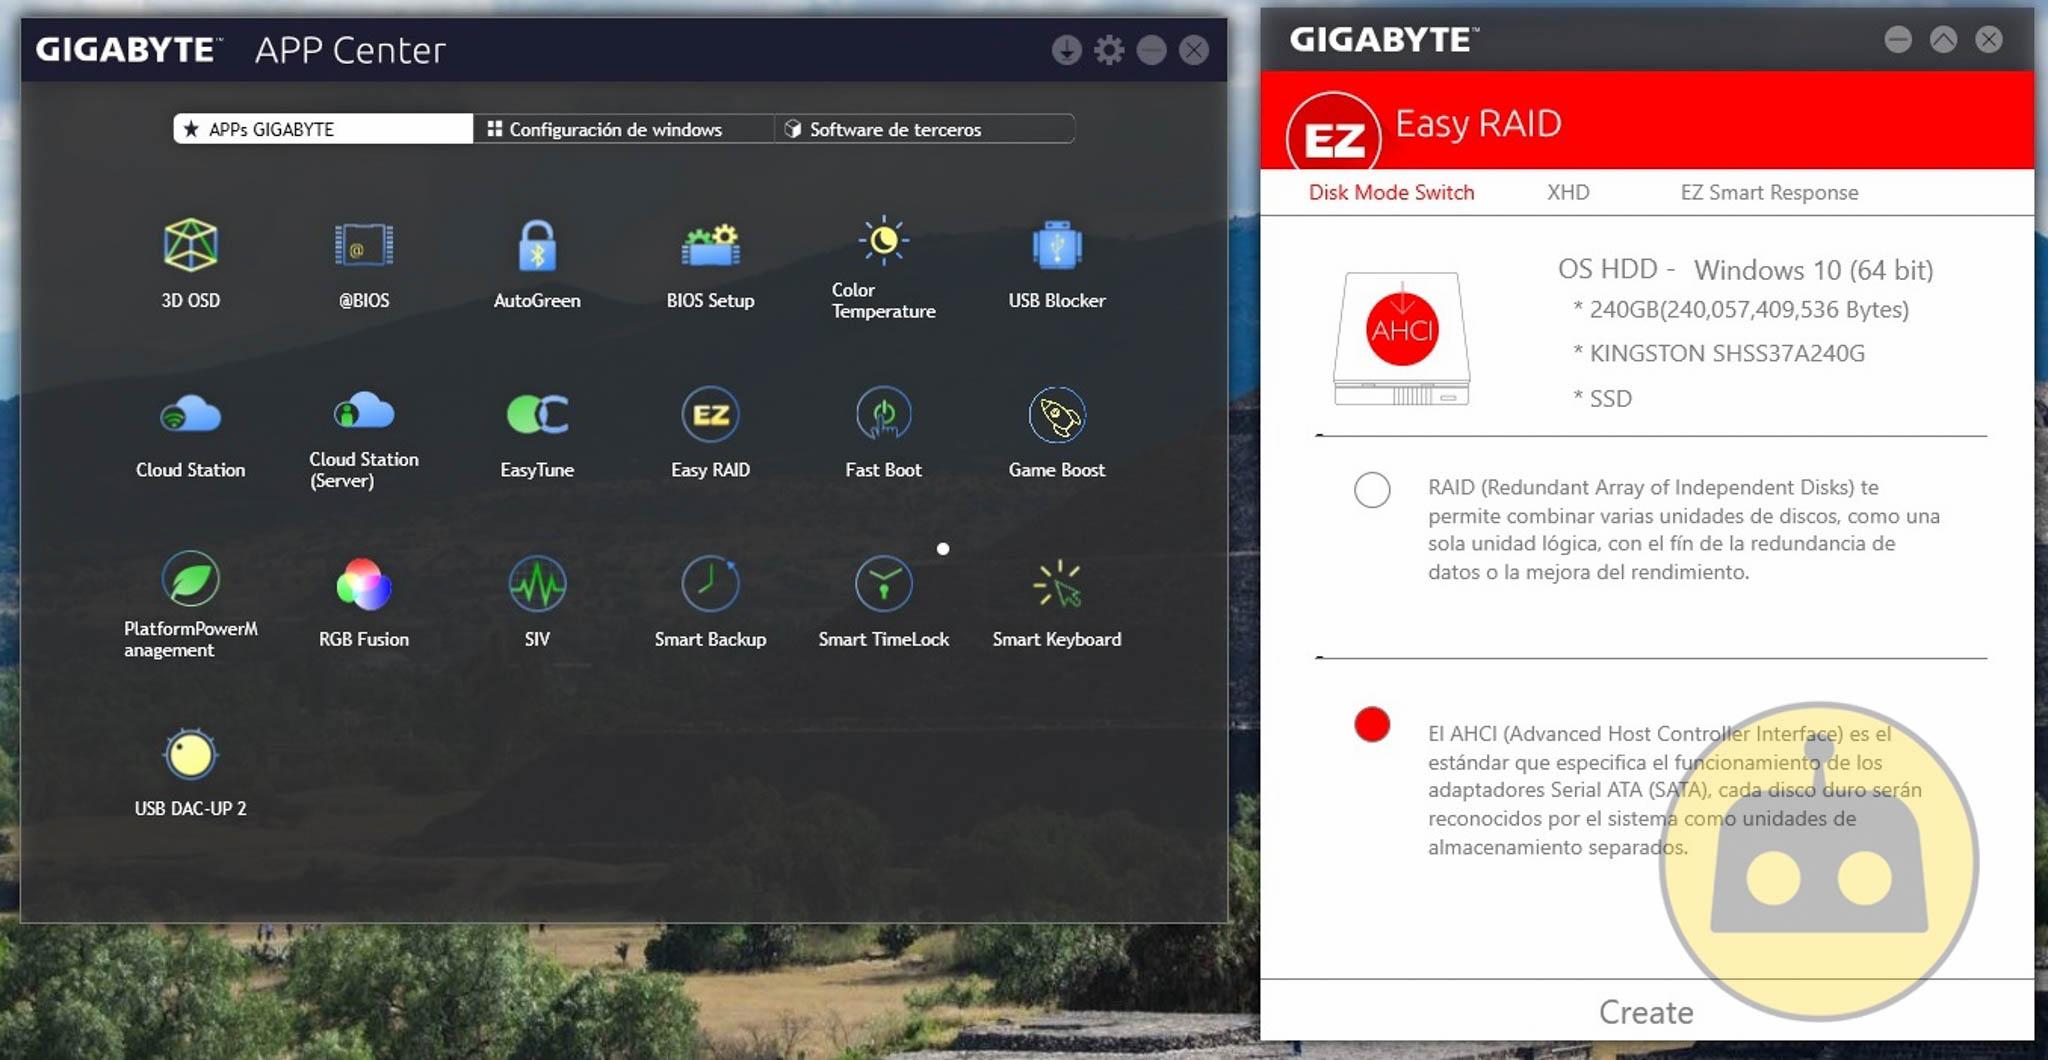 GIGABYTE-200Series-APP-Center-3D-RAID-01 - BOTech-News